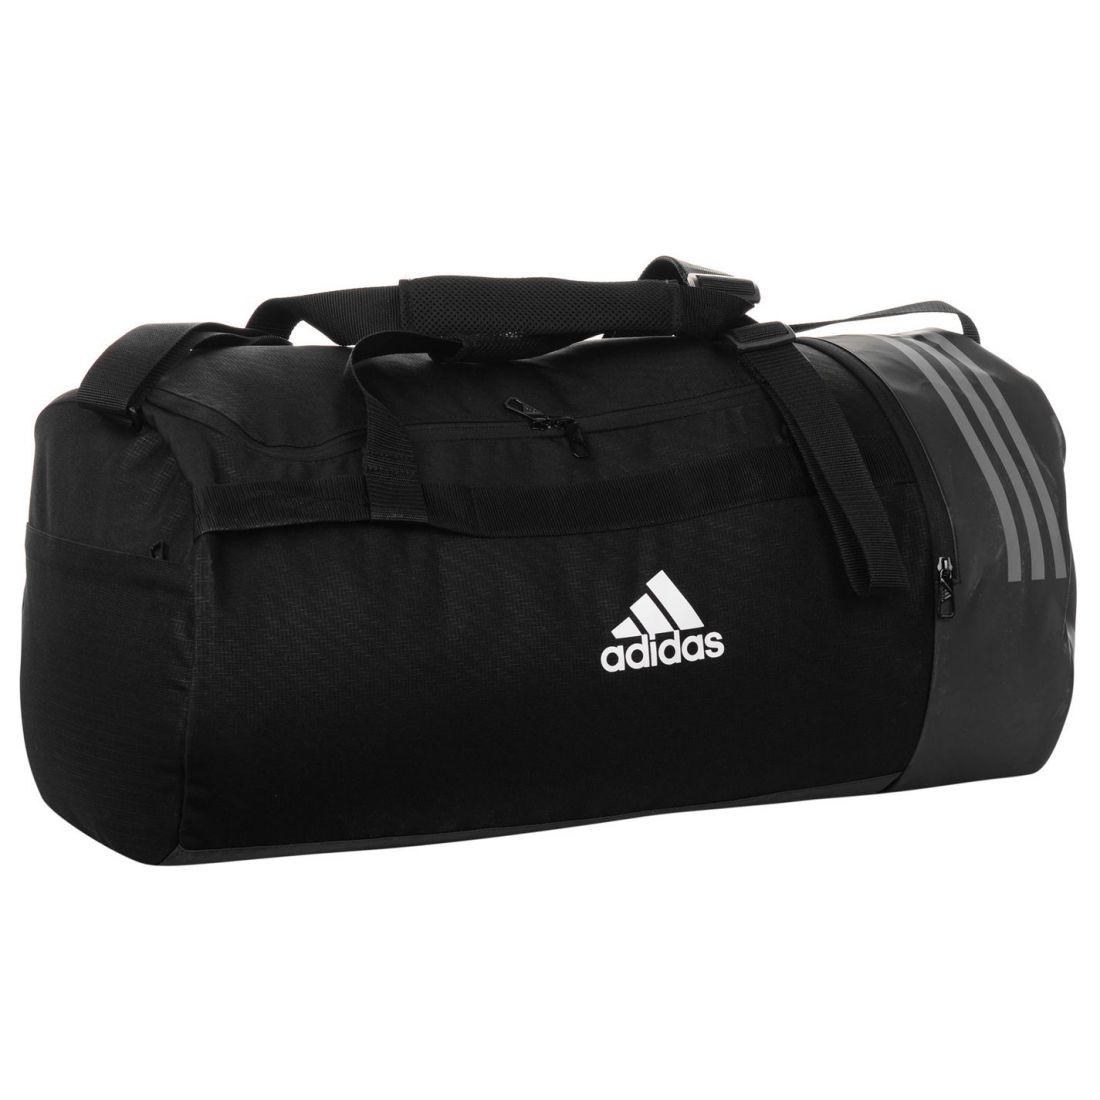 559d7fd84 adidas Unisex Convertible 3 Stripe Duffel Bag Holdall Zip Mesh ...